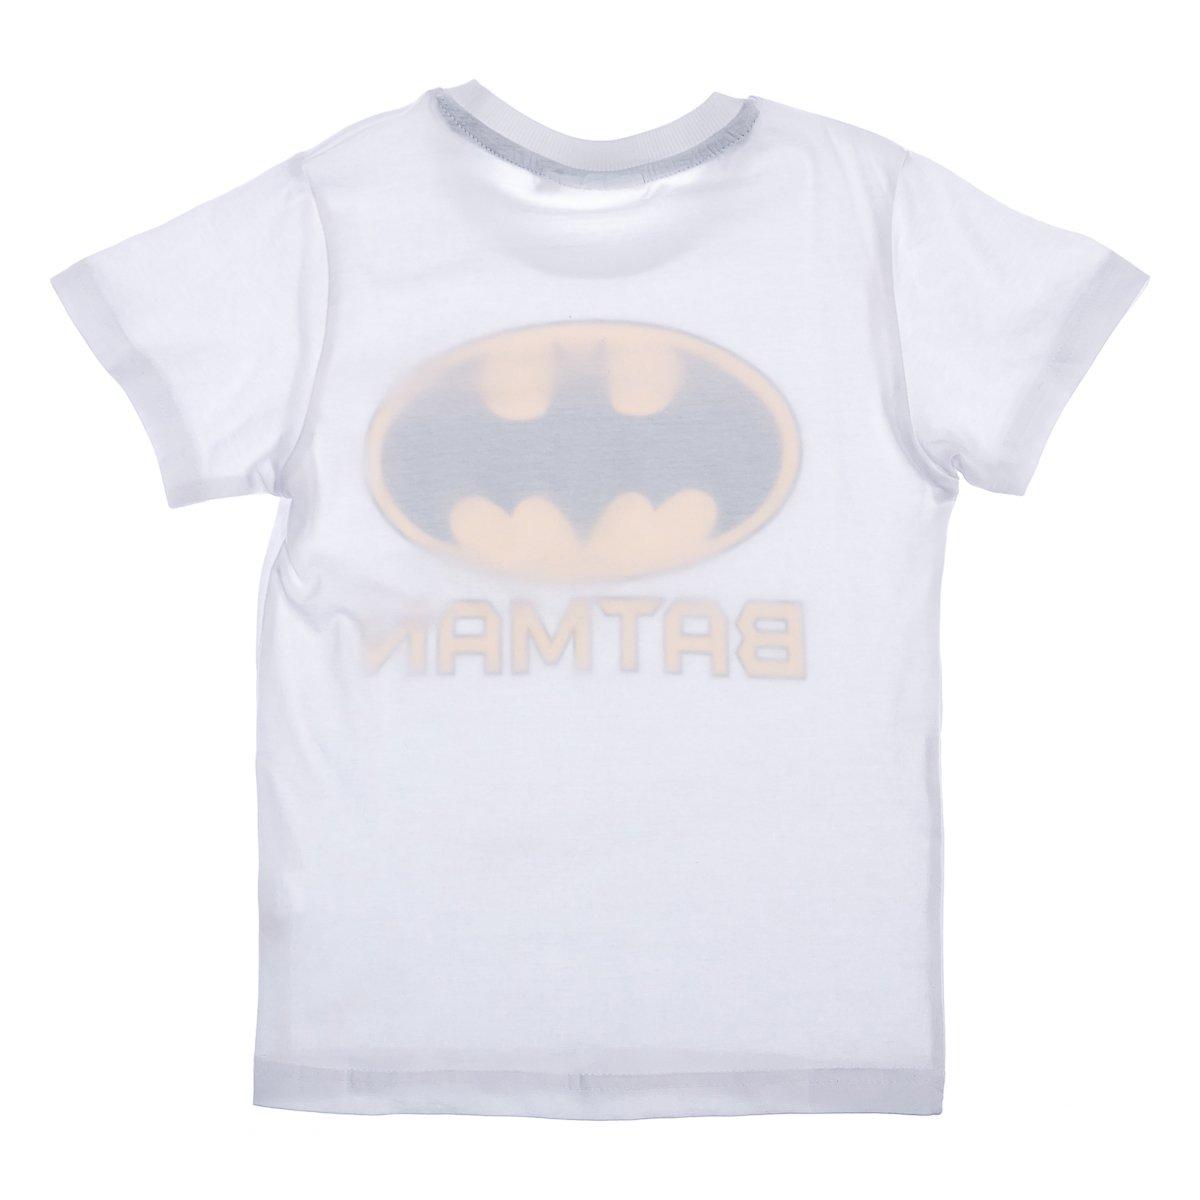 Купить Футболки, майки, топы, туники, Футболка E Plus M Batman White, р. 140 BAT5202184 ТМ: E Plus M, белый